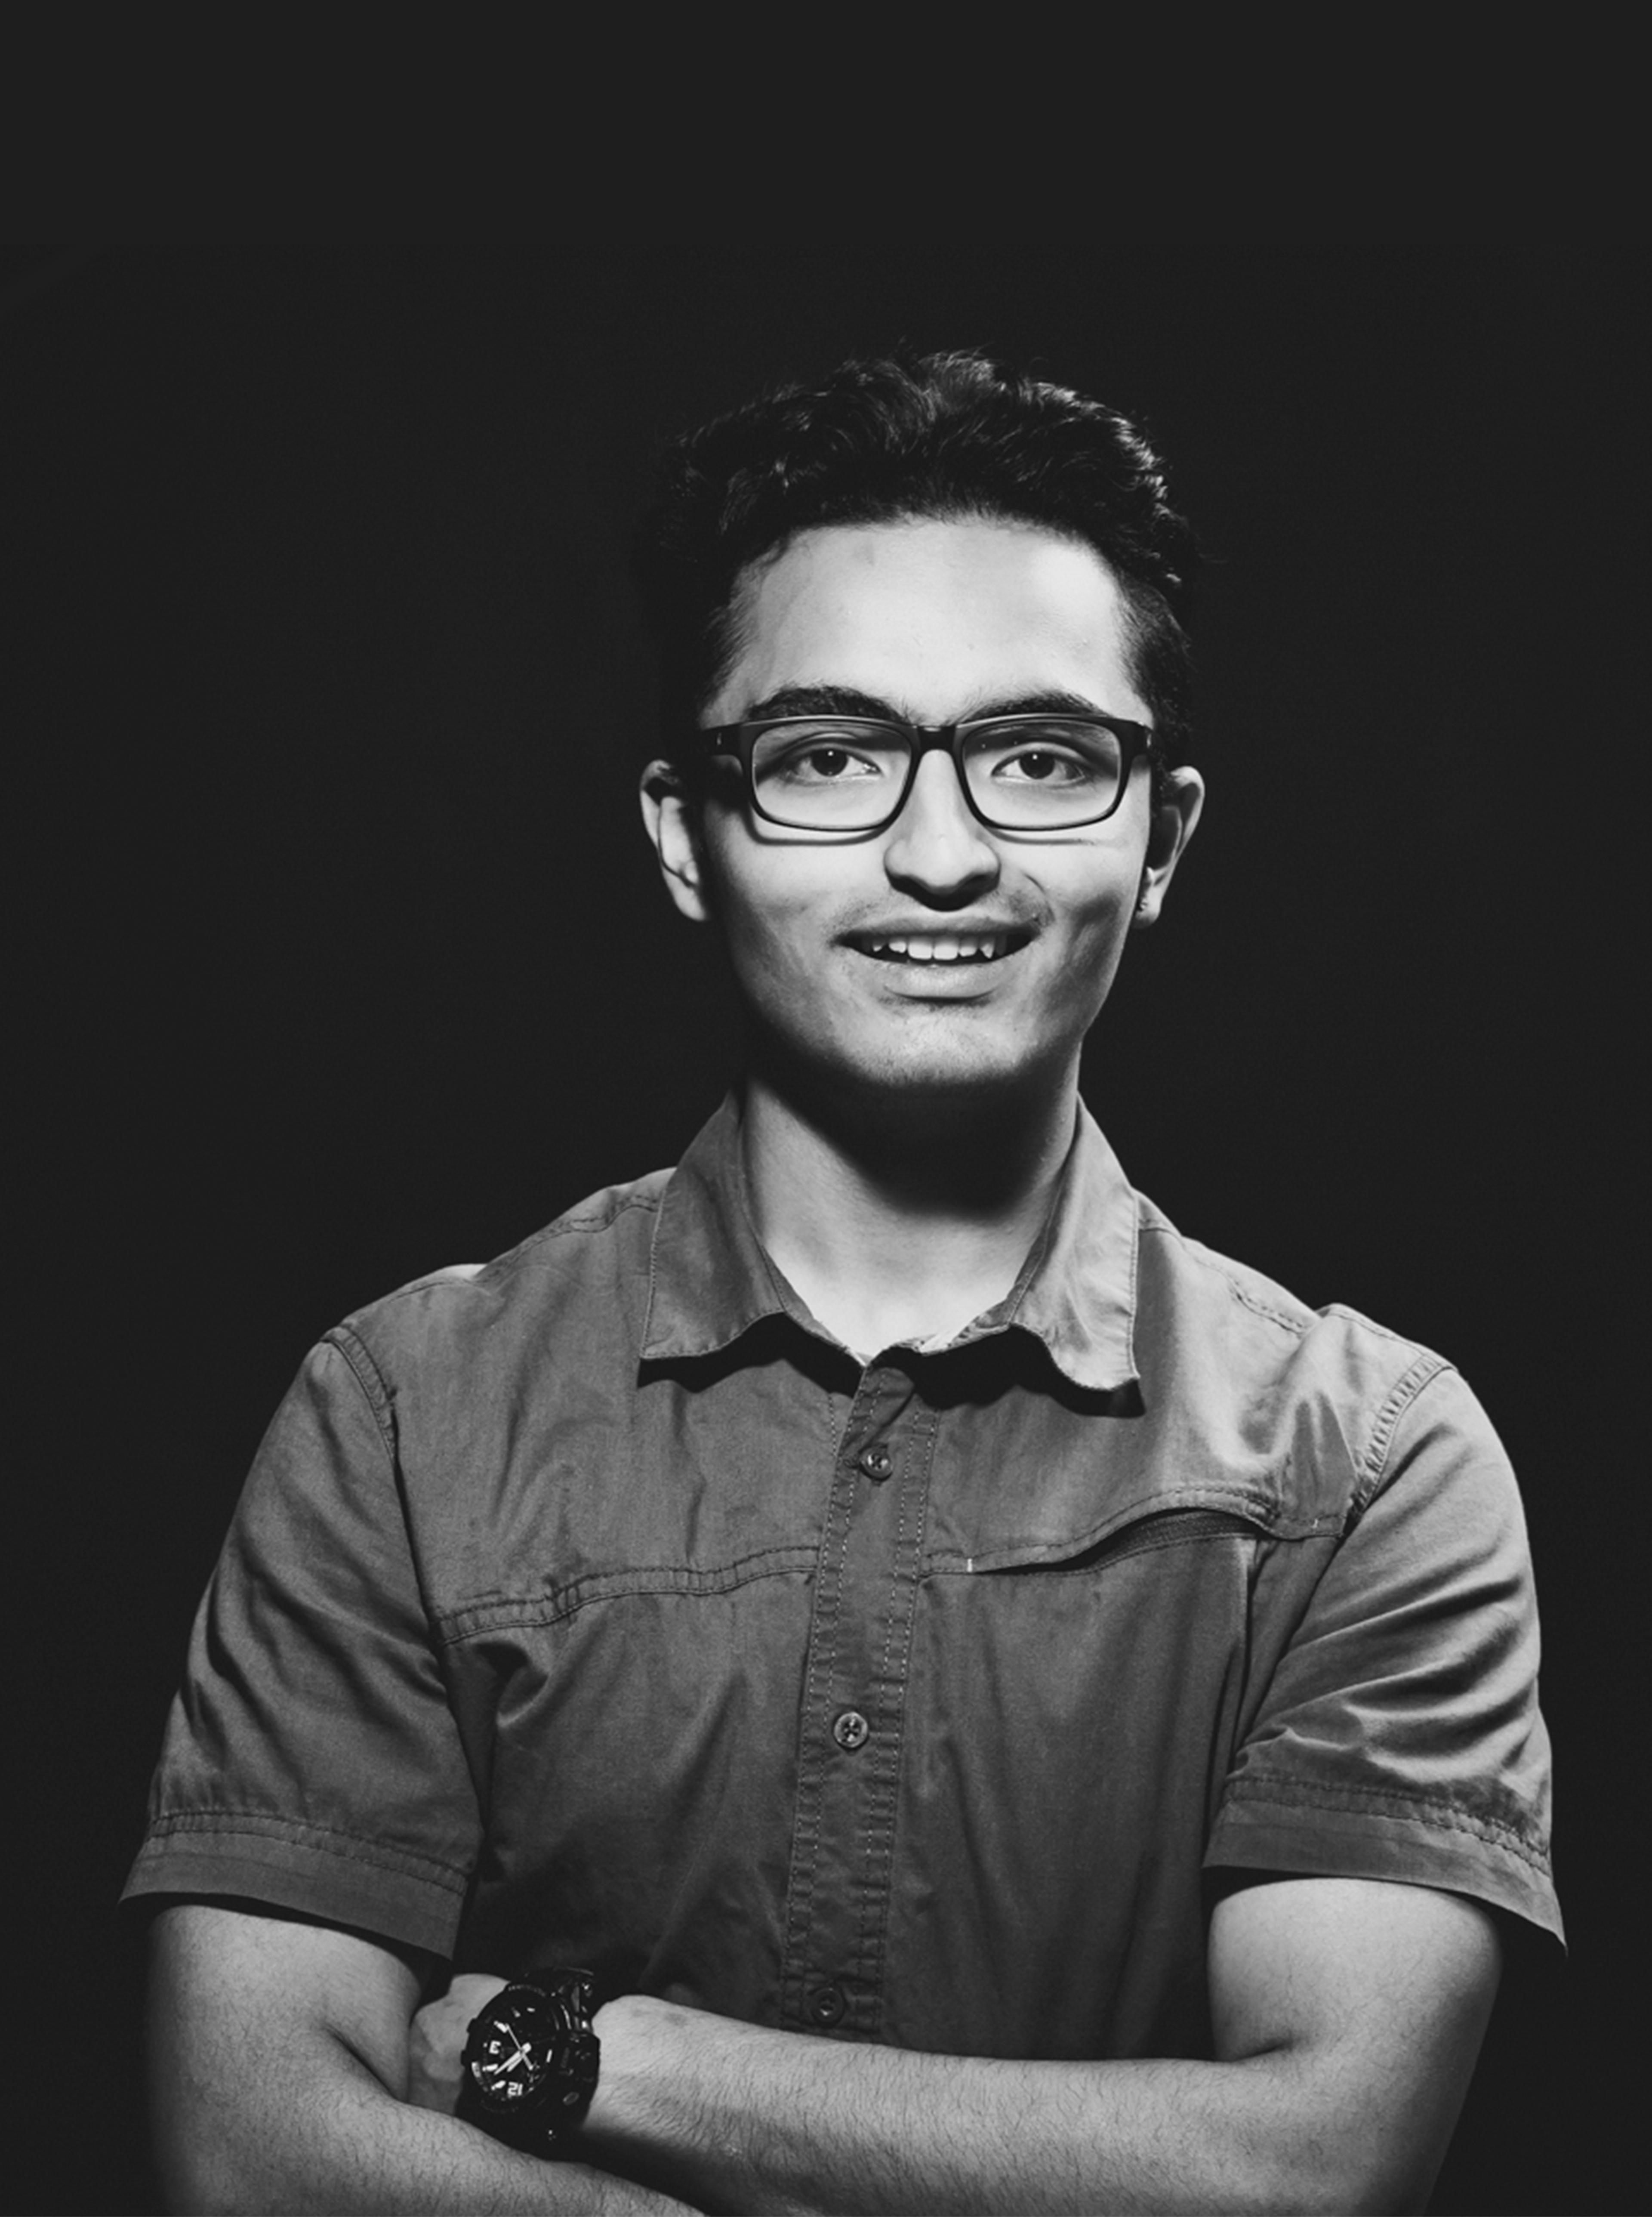 Dhruv Khanduri